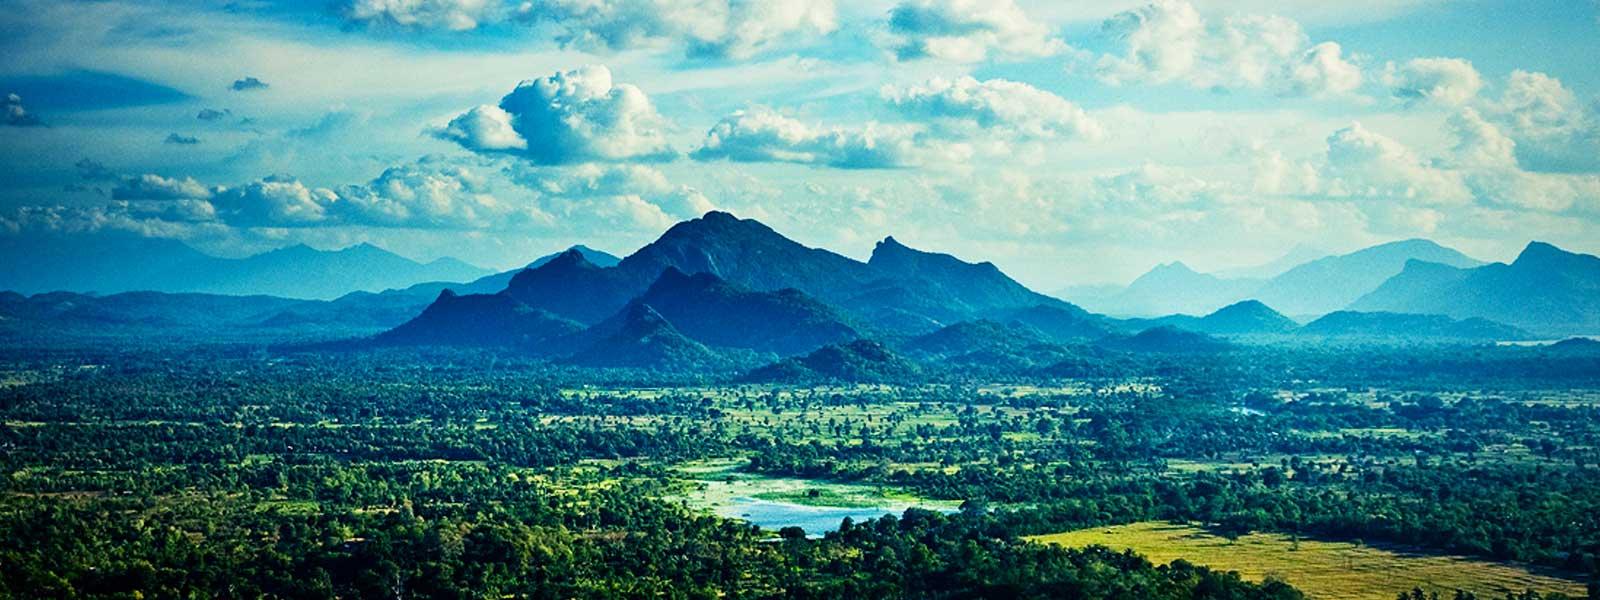 Sri lanka tourism pictures SRI LANKA TSL - The Times of Sri Lanka (Published in)